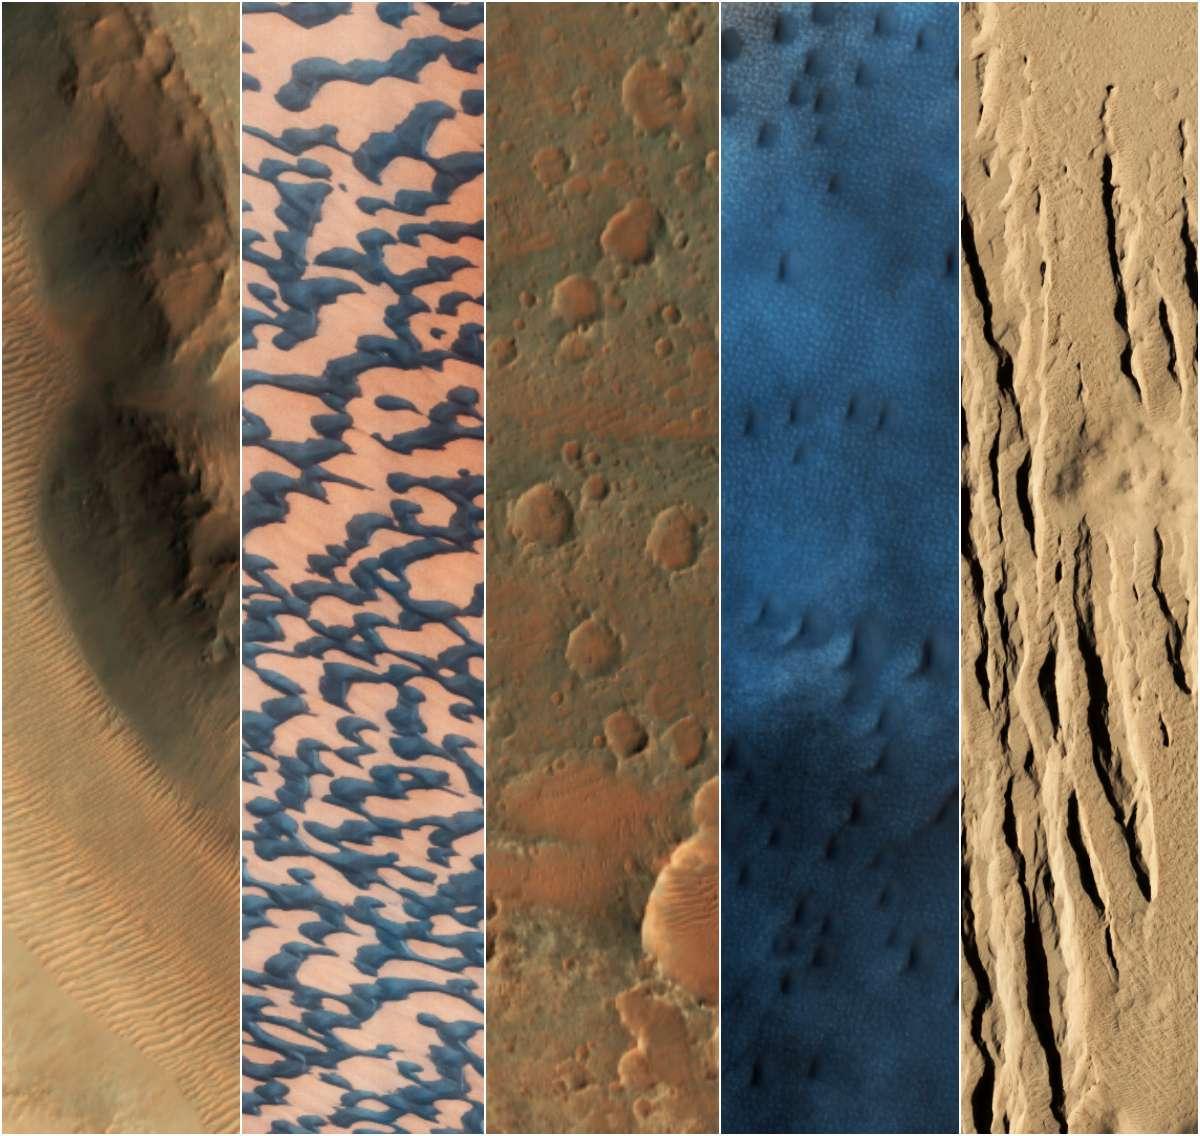 A vivid sampling of Martian landscapes, as captured by the HiRISE camera aboard NASA's Mars Reconnaissance Orbiter.